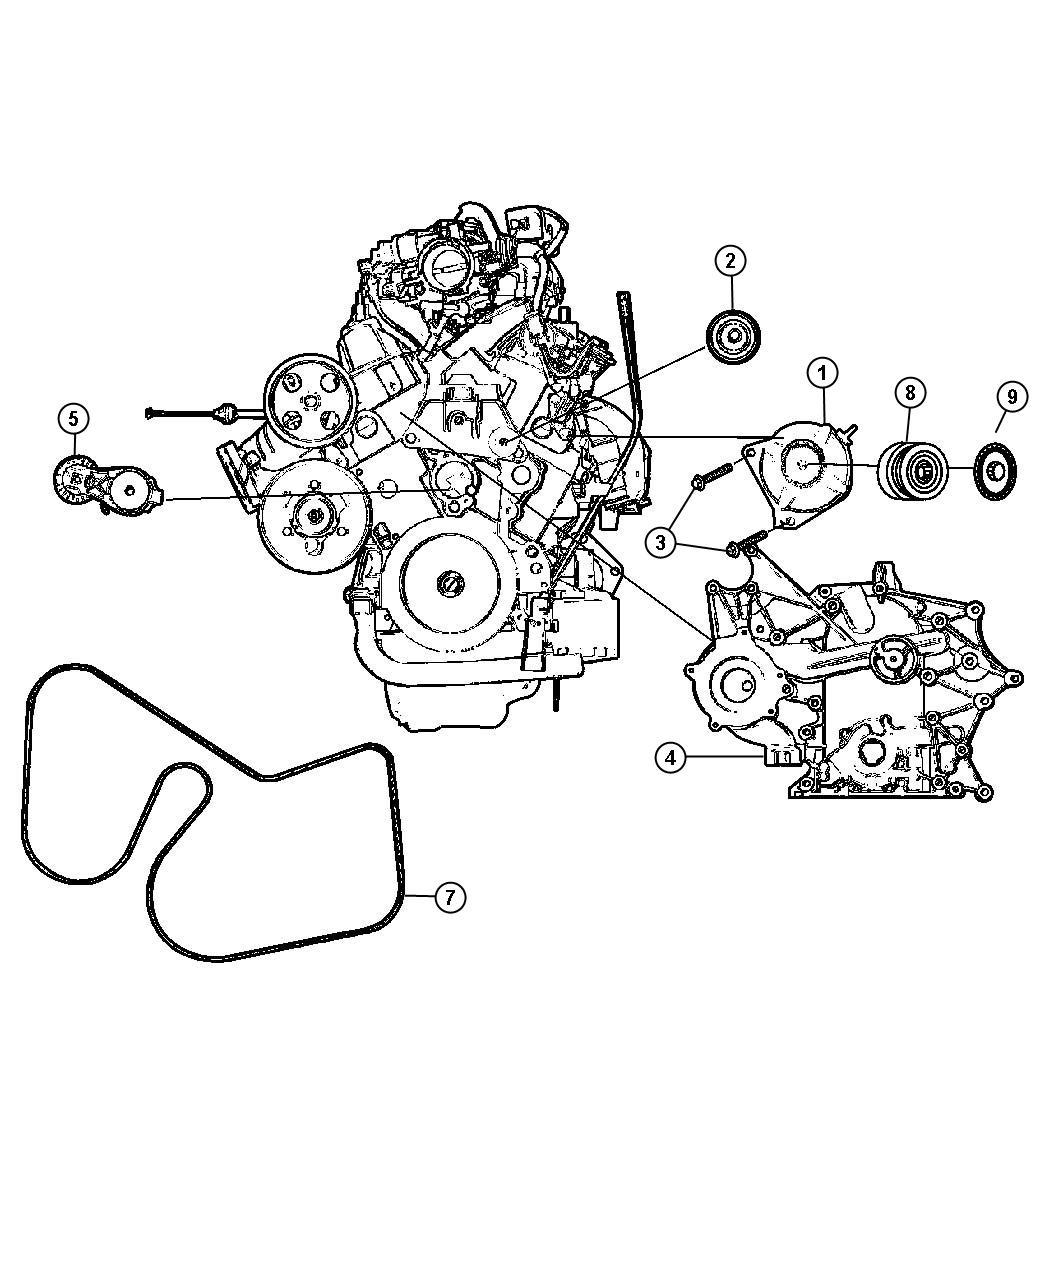 2005 dodge grand caravan generator  engine   alternator - 160 amp    alternator